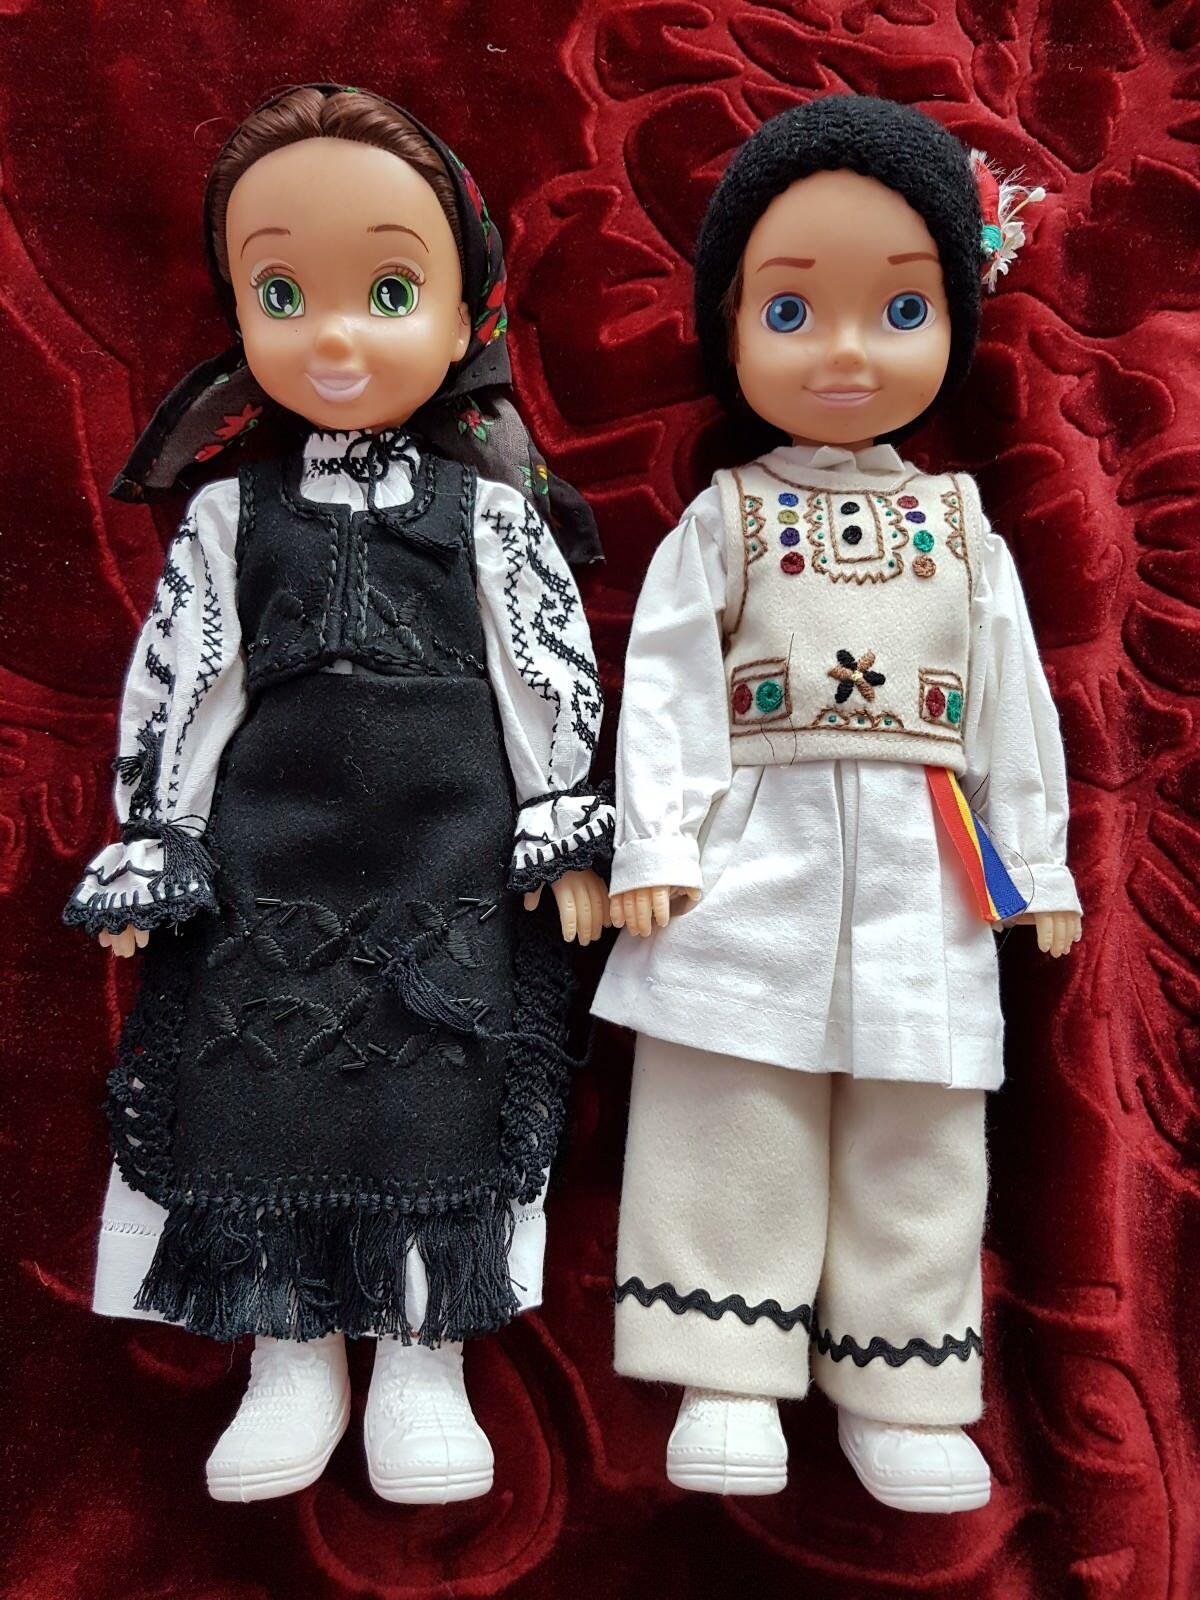 Pareja rumana tradicional de ropa vintage muñeca